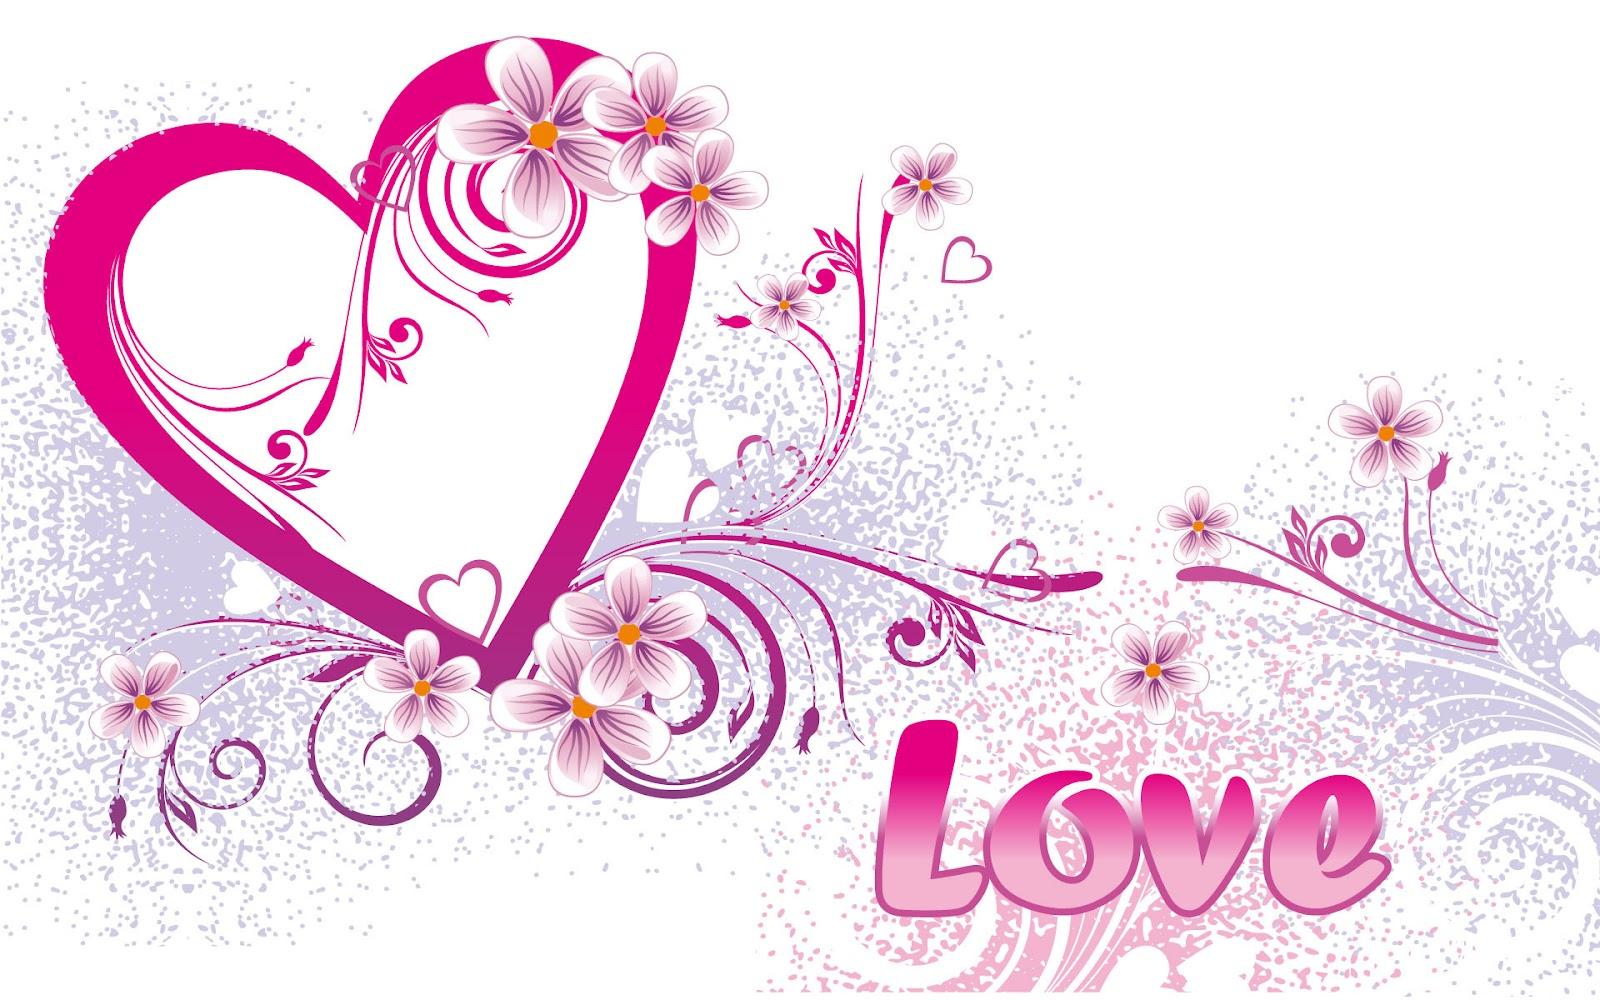 Wallpaper Love Gambar Cinta Paling Romantis